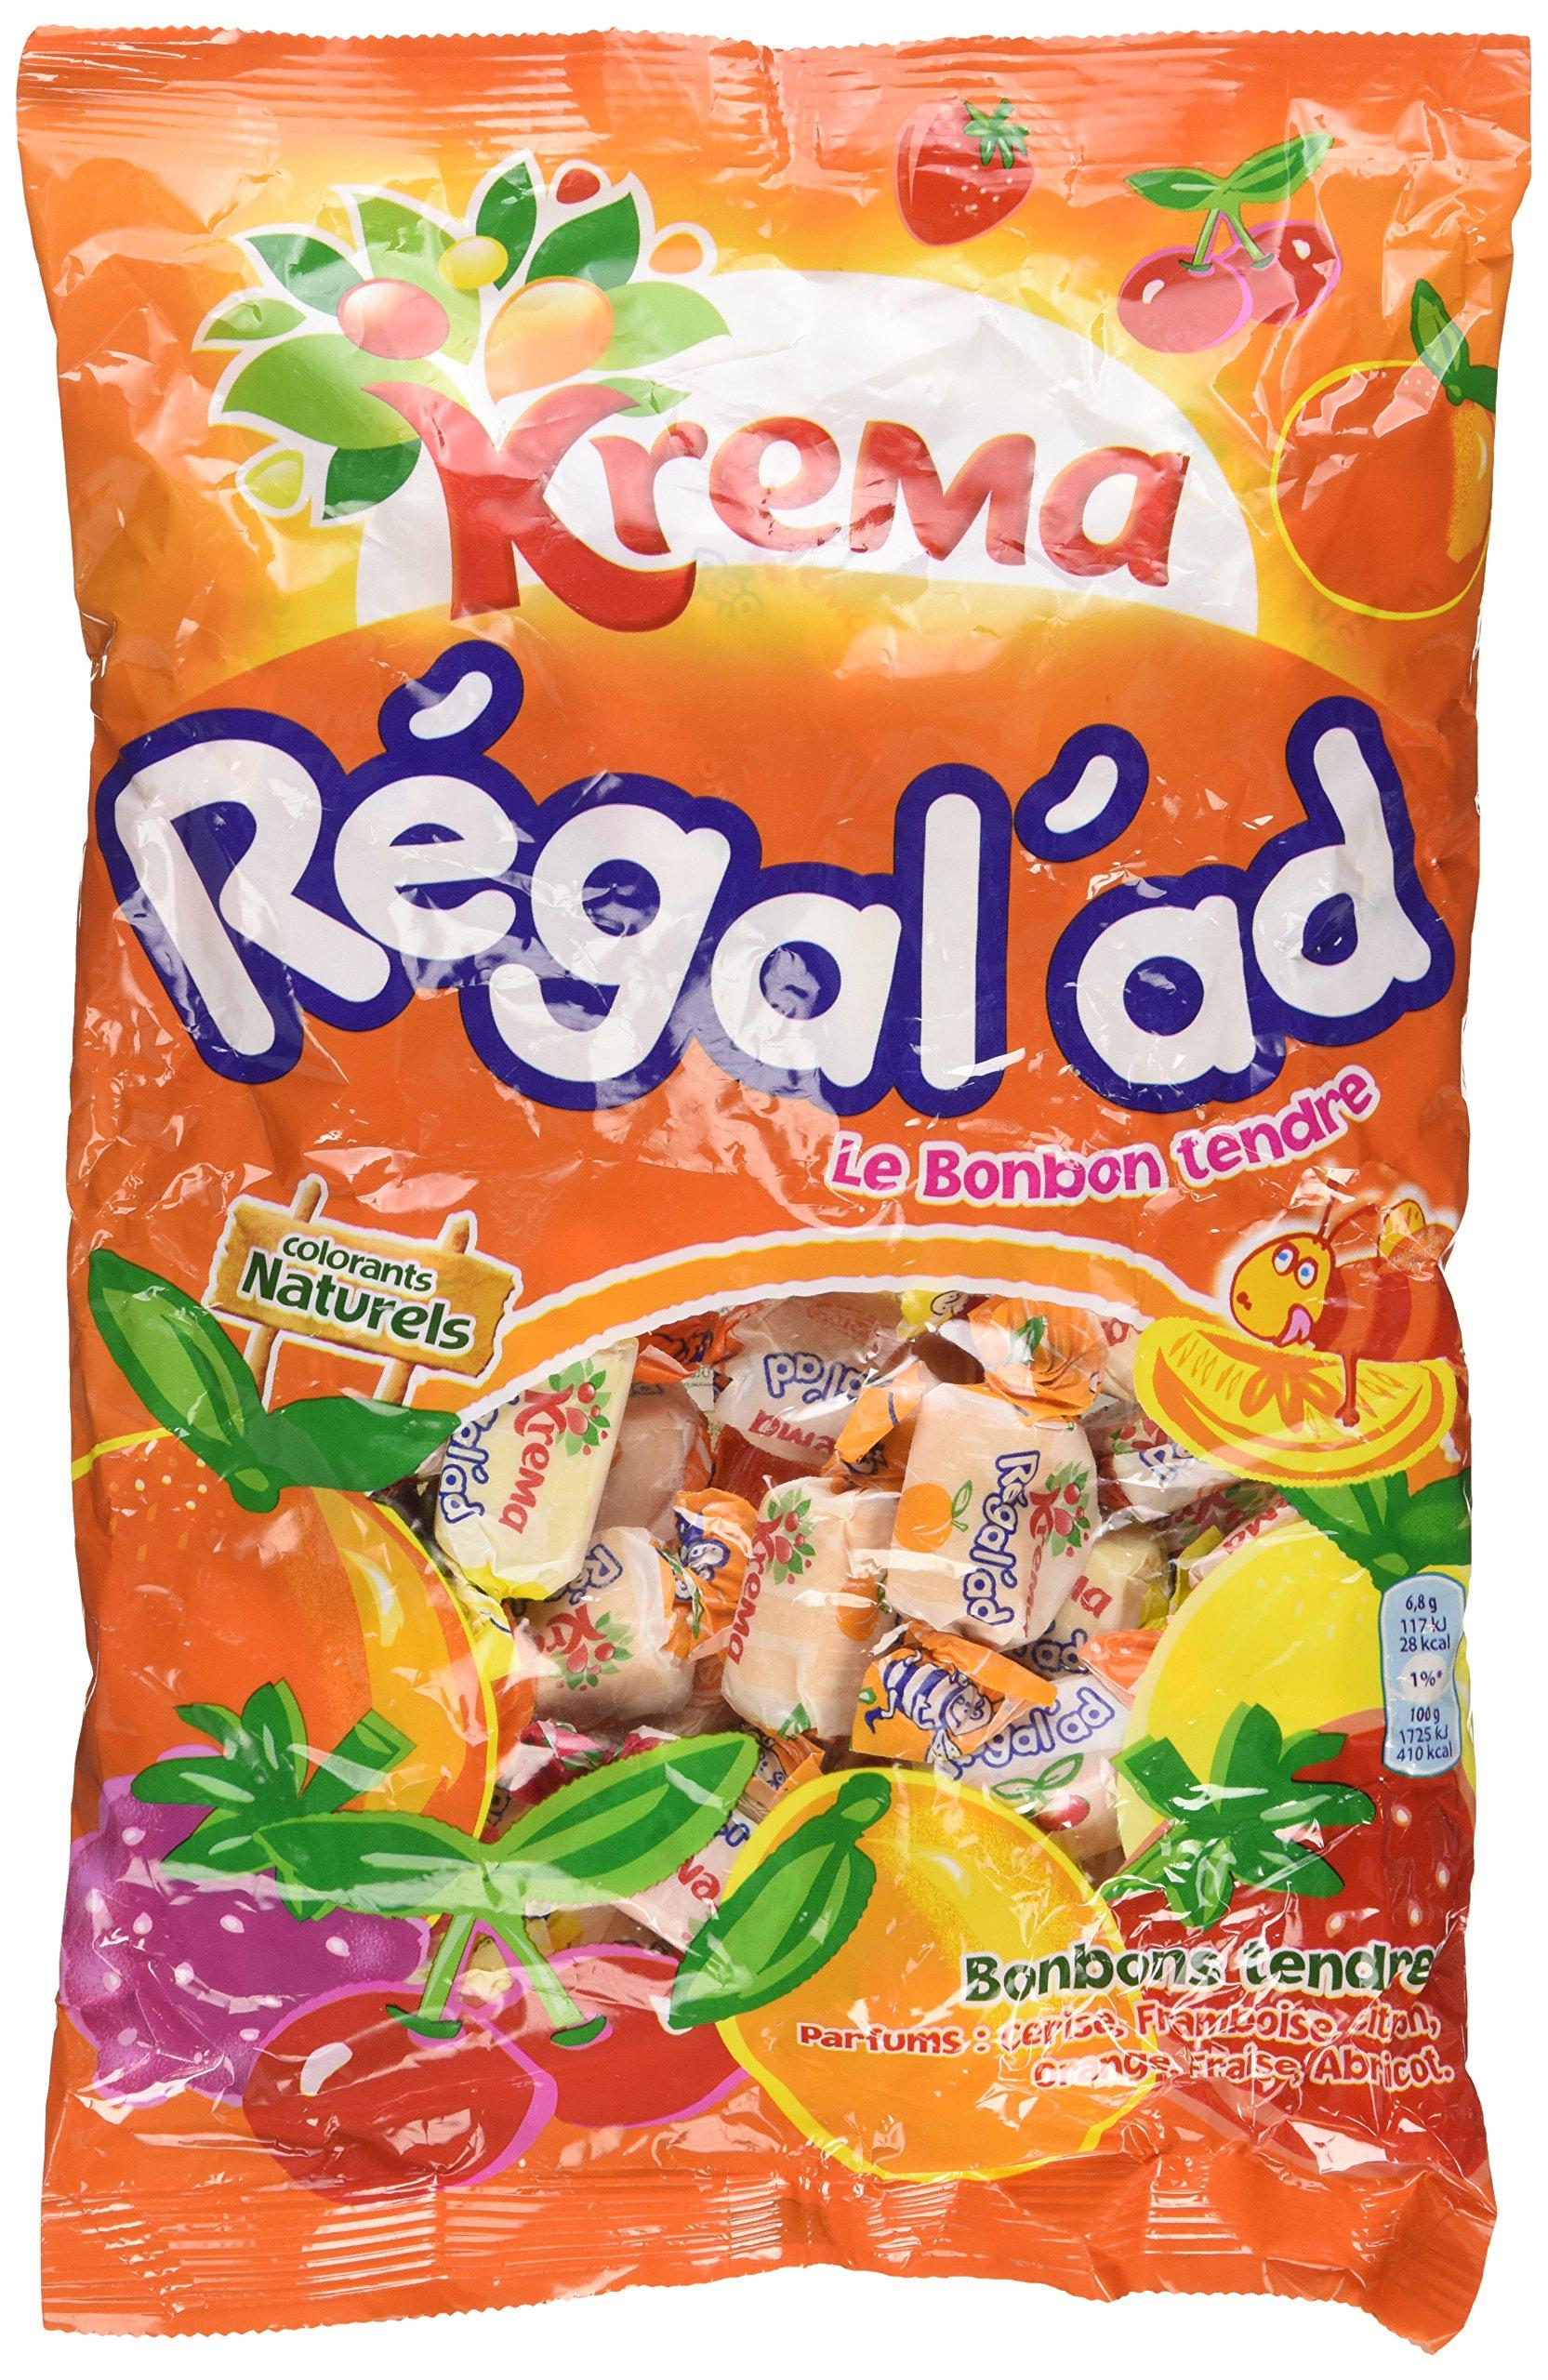 Krema Regal'ad 360g Chewy French Candy